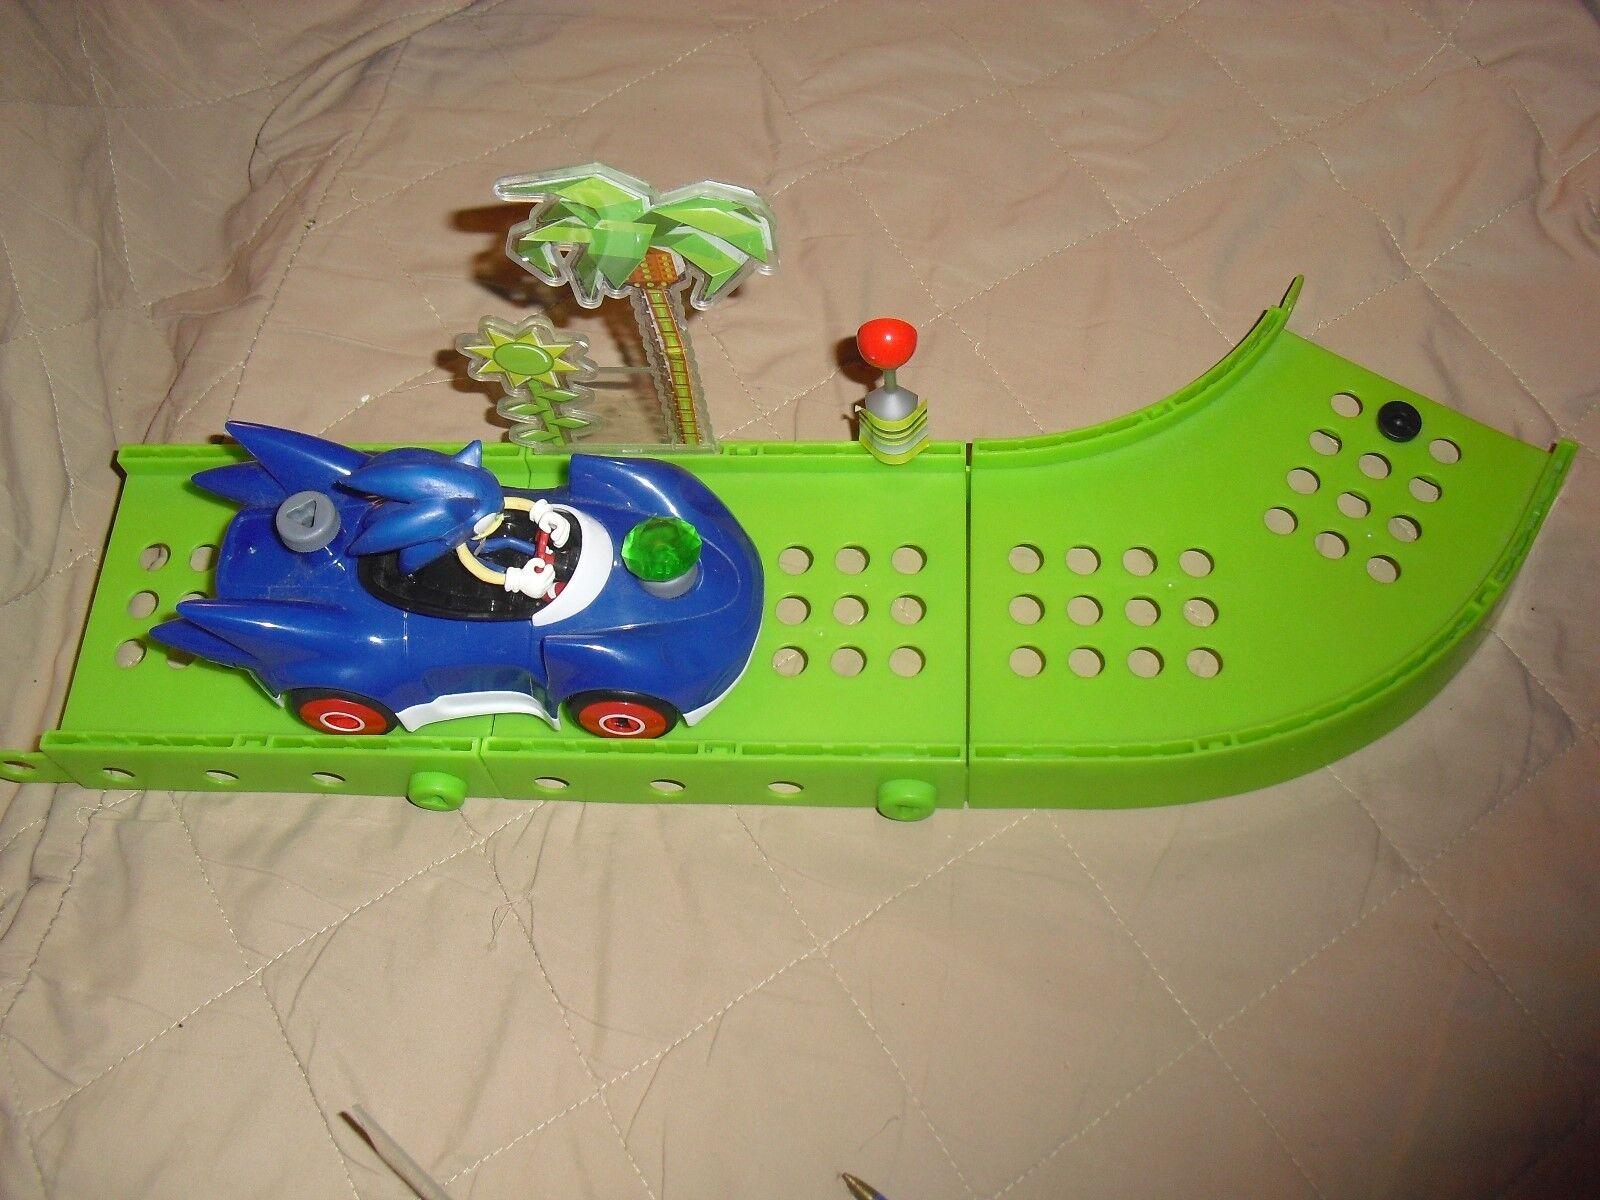 Sonic the hedgehog meccano erector set speed star toy car figure set